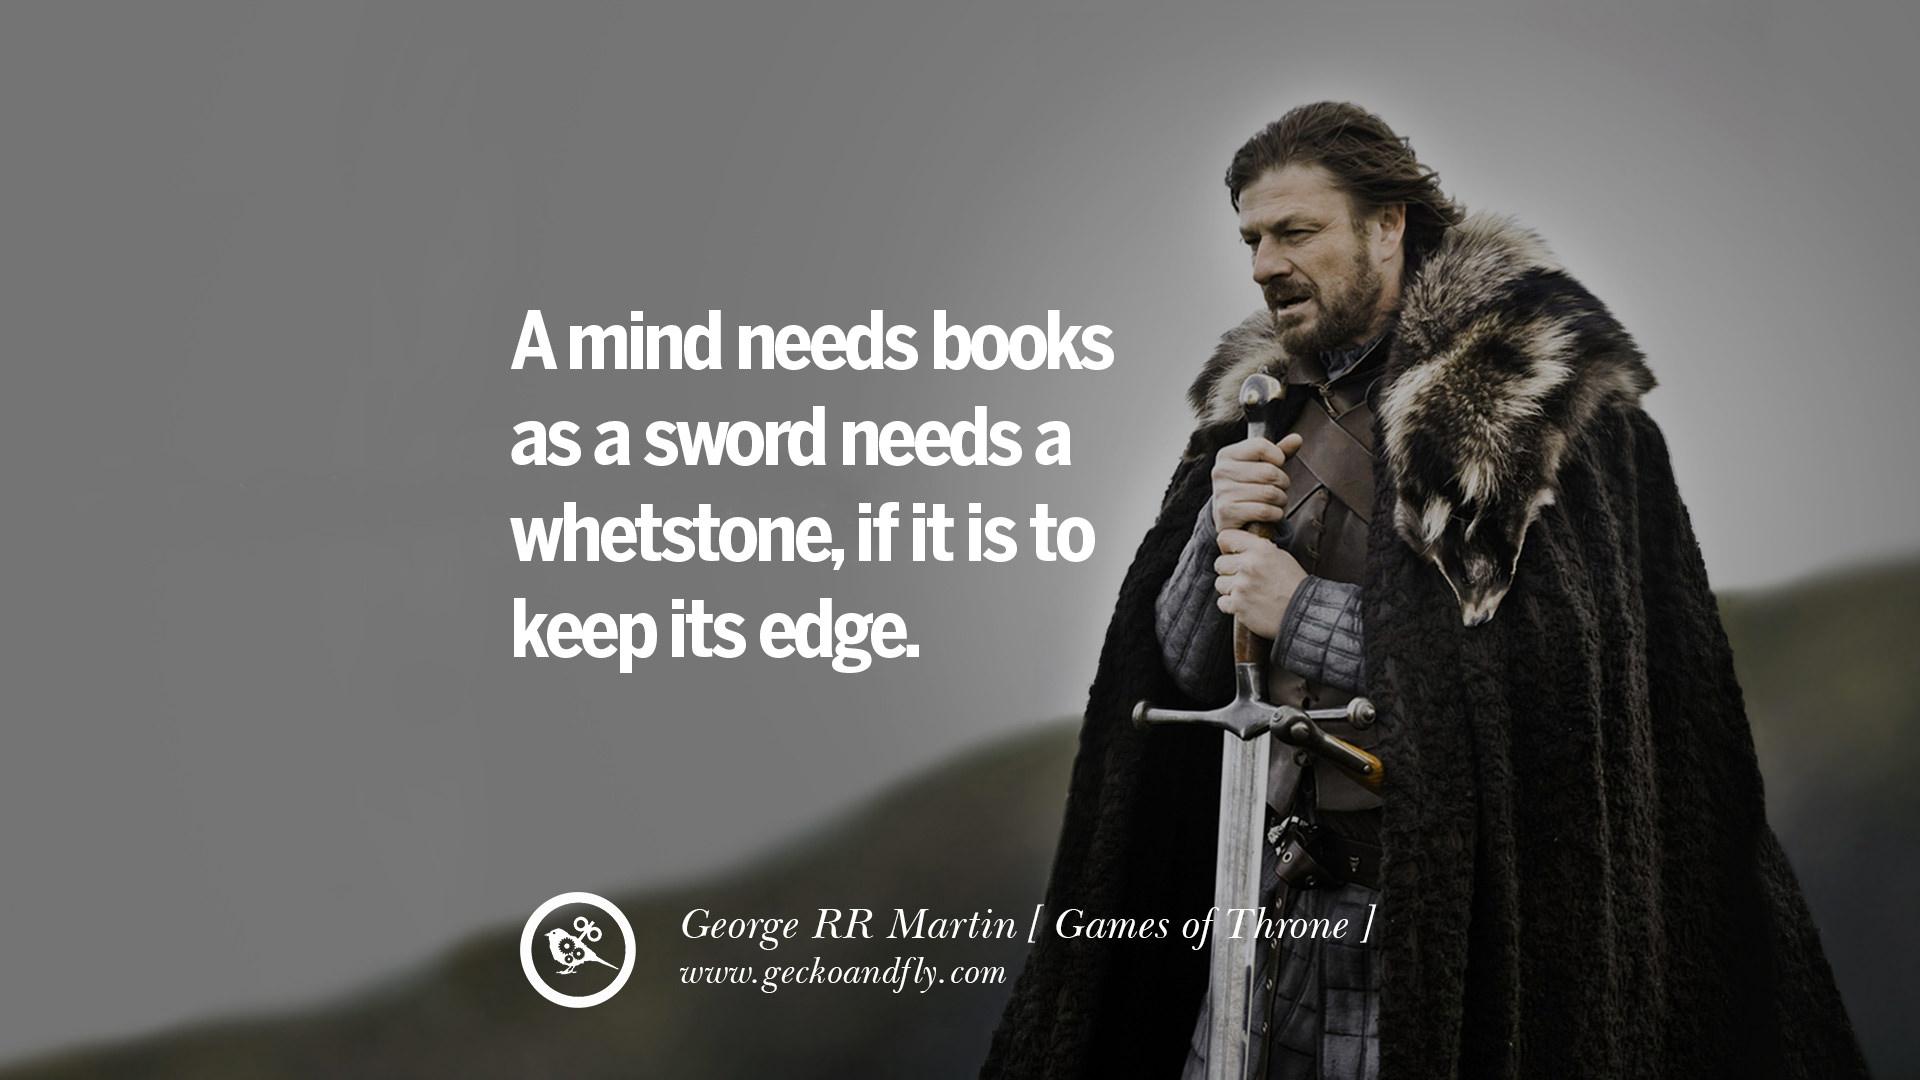 84921b14f A mind needs books as a sword needs a whetstone, if it is to keep its edge.